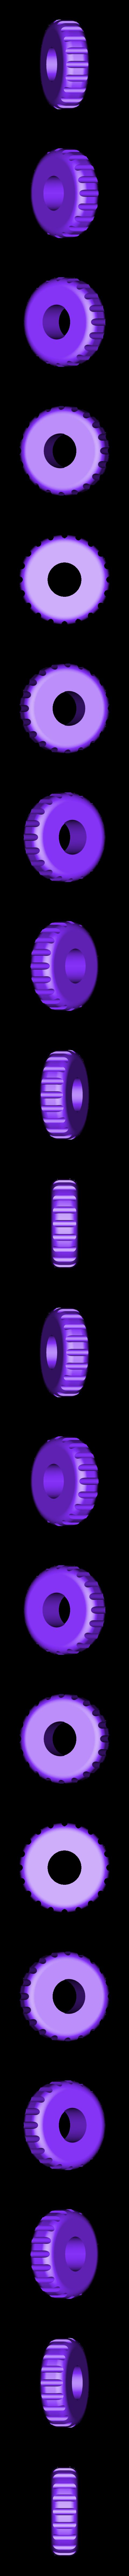 Blender_Thumbwheel.STL Download free STL file Hand Mixer • 3D printable design, alterboy987